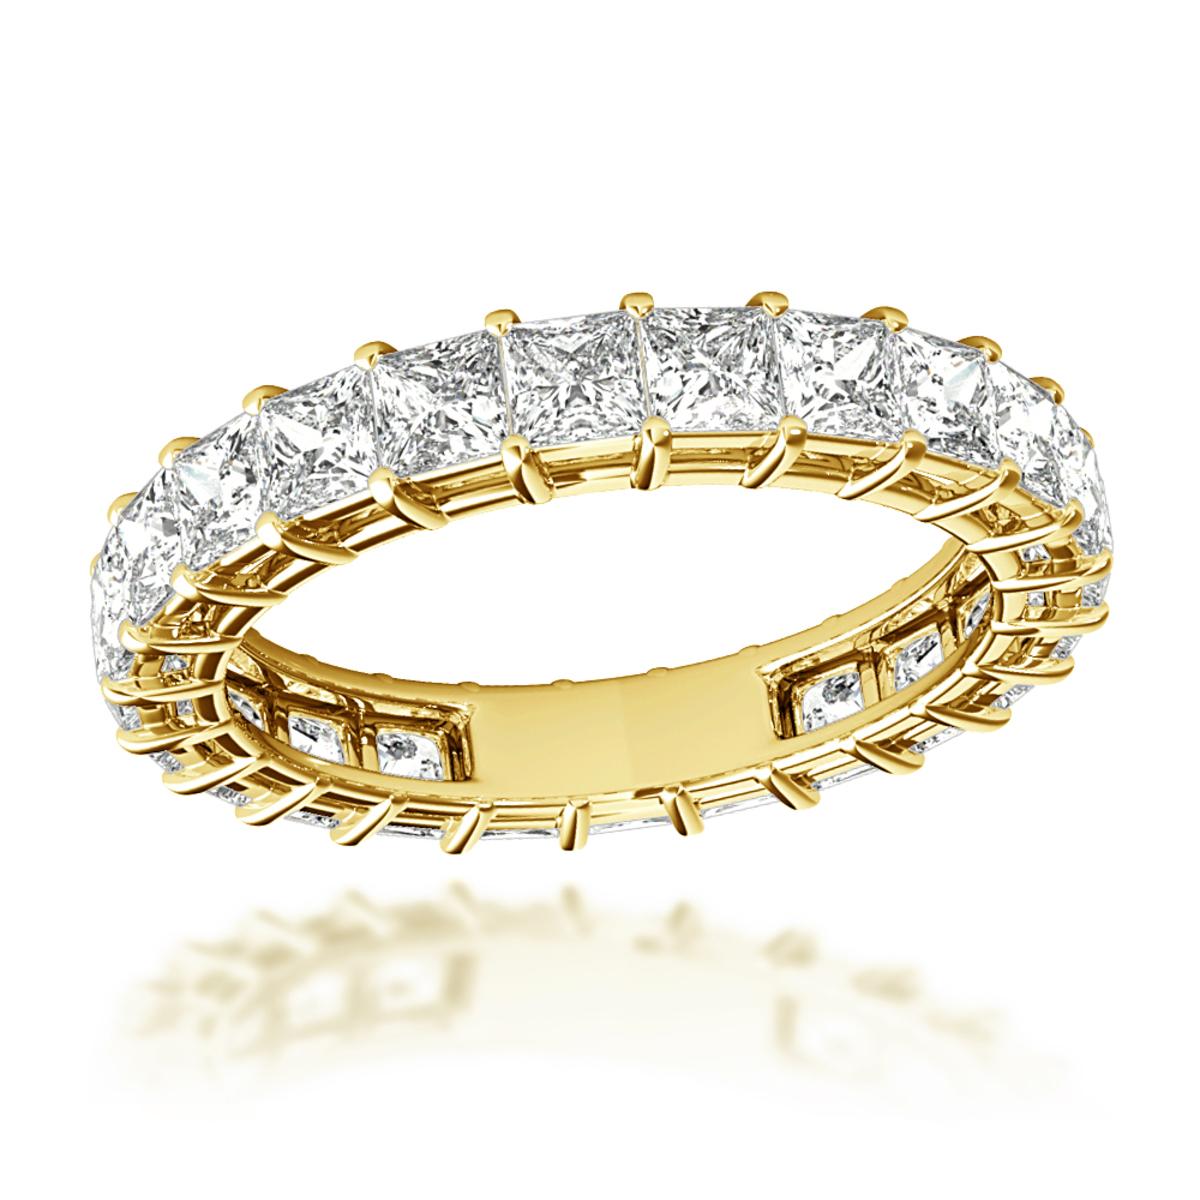 Anniversary Rings 18K Gold Princess Cut Diamond Eternity Band 3ct G/VS